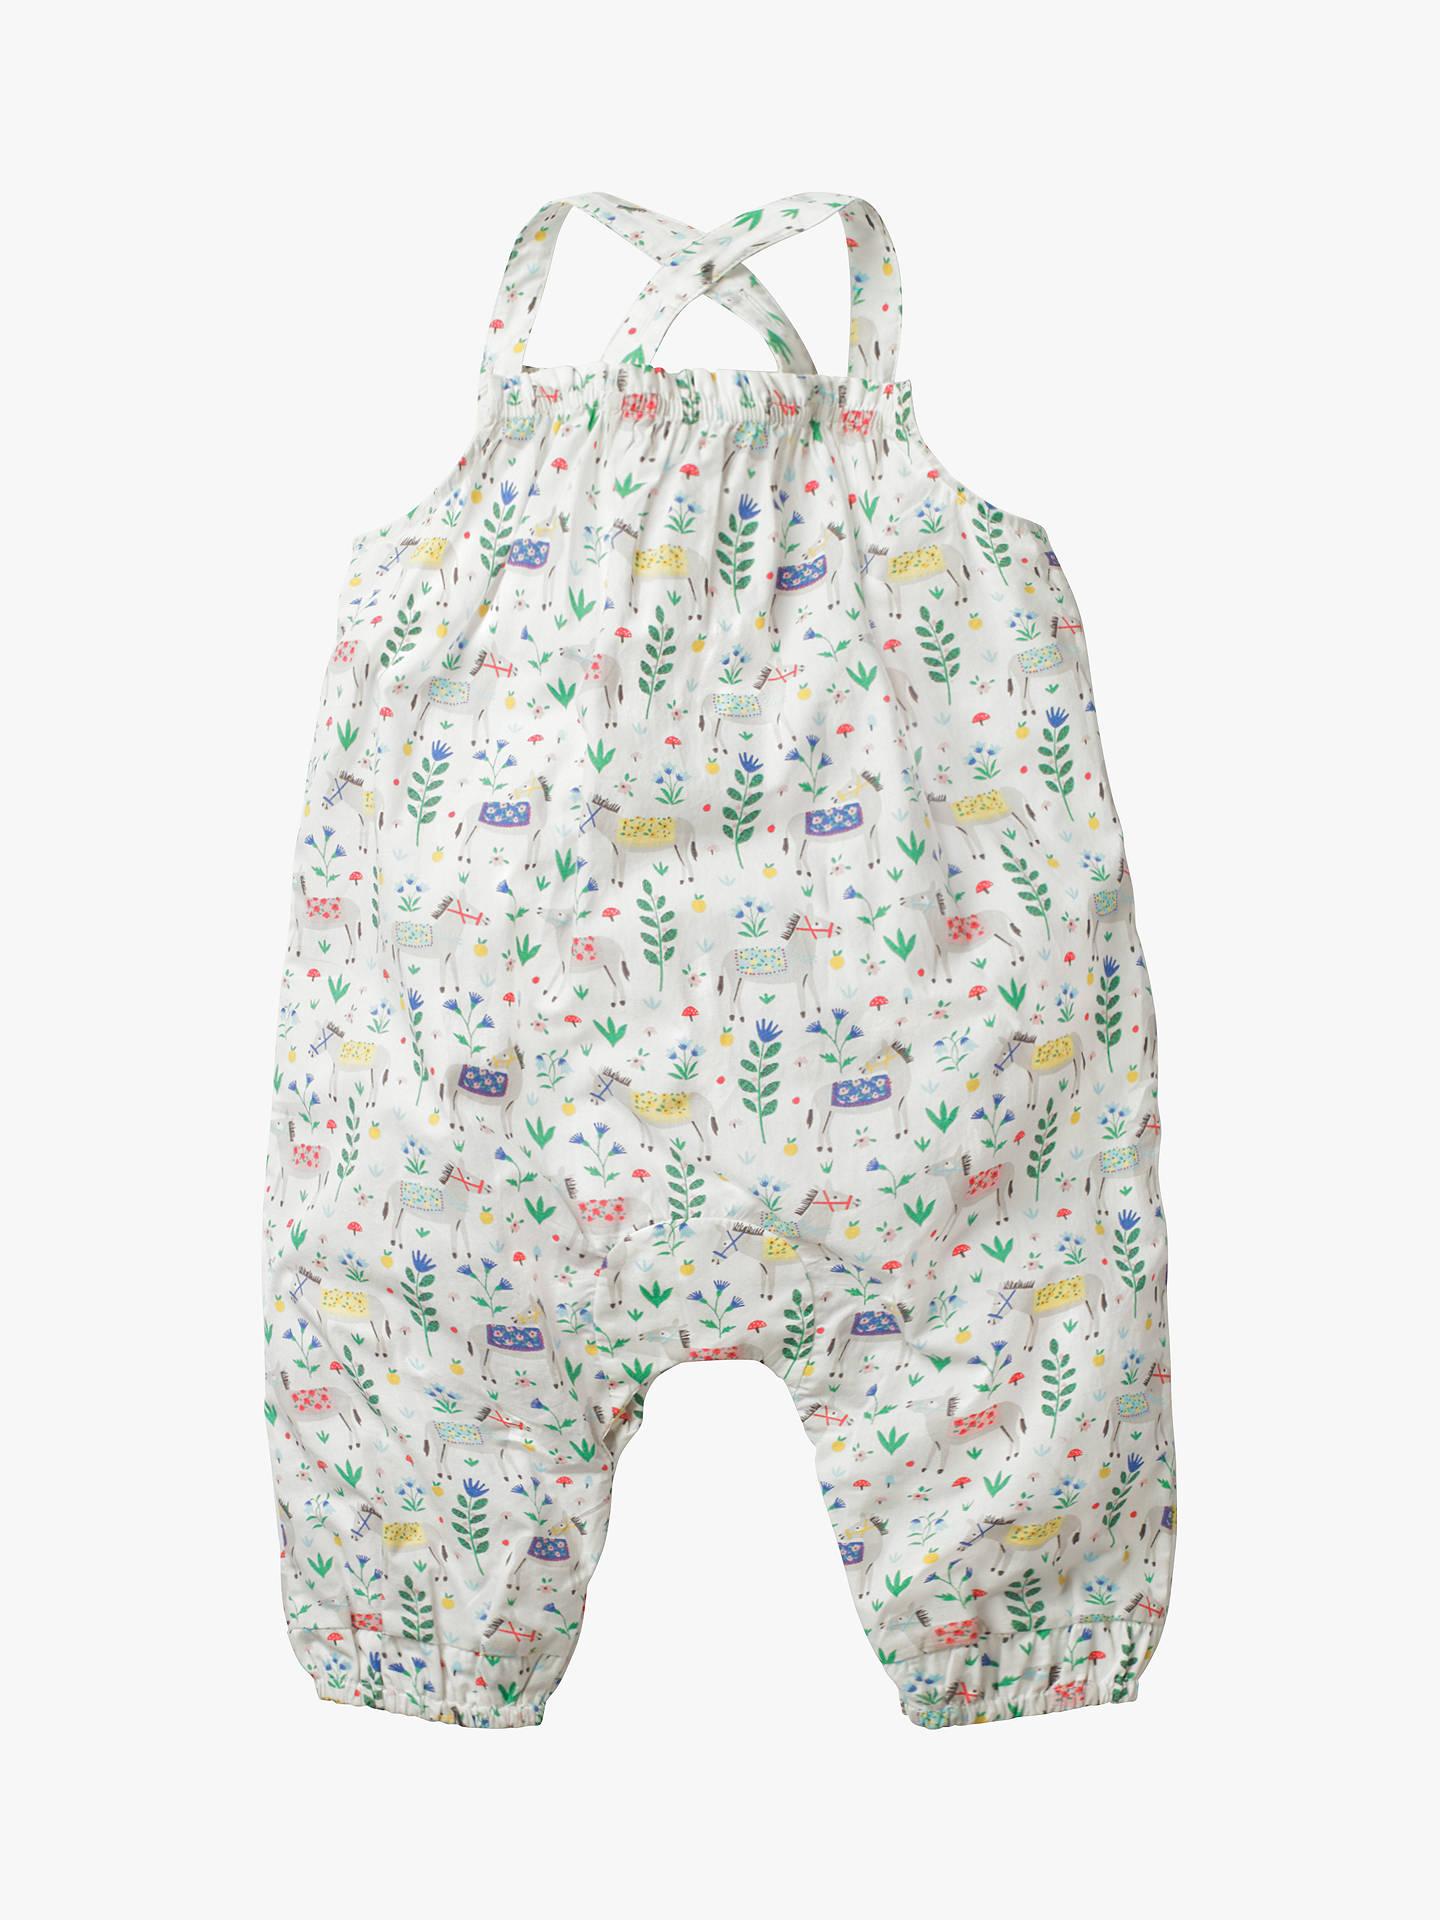 3b3dda454 ... Buy Mini Boden Baby Smocked Floral Playsuit, Multi, 0-3 months Online  at ...